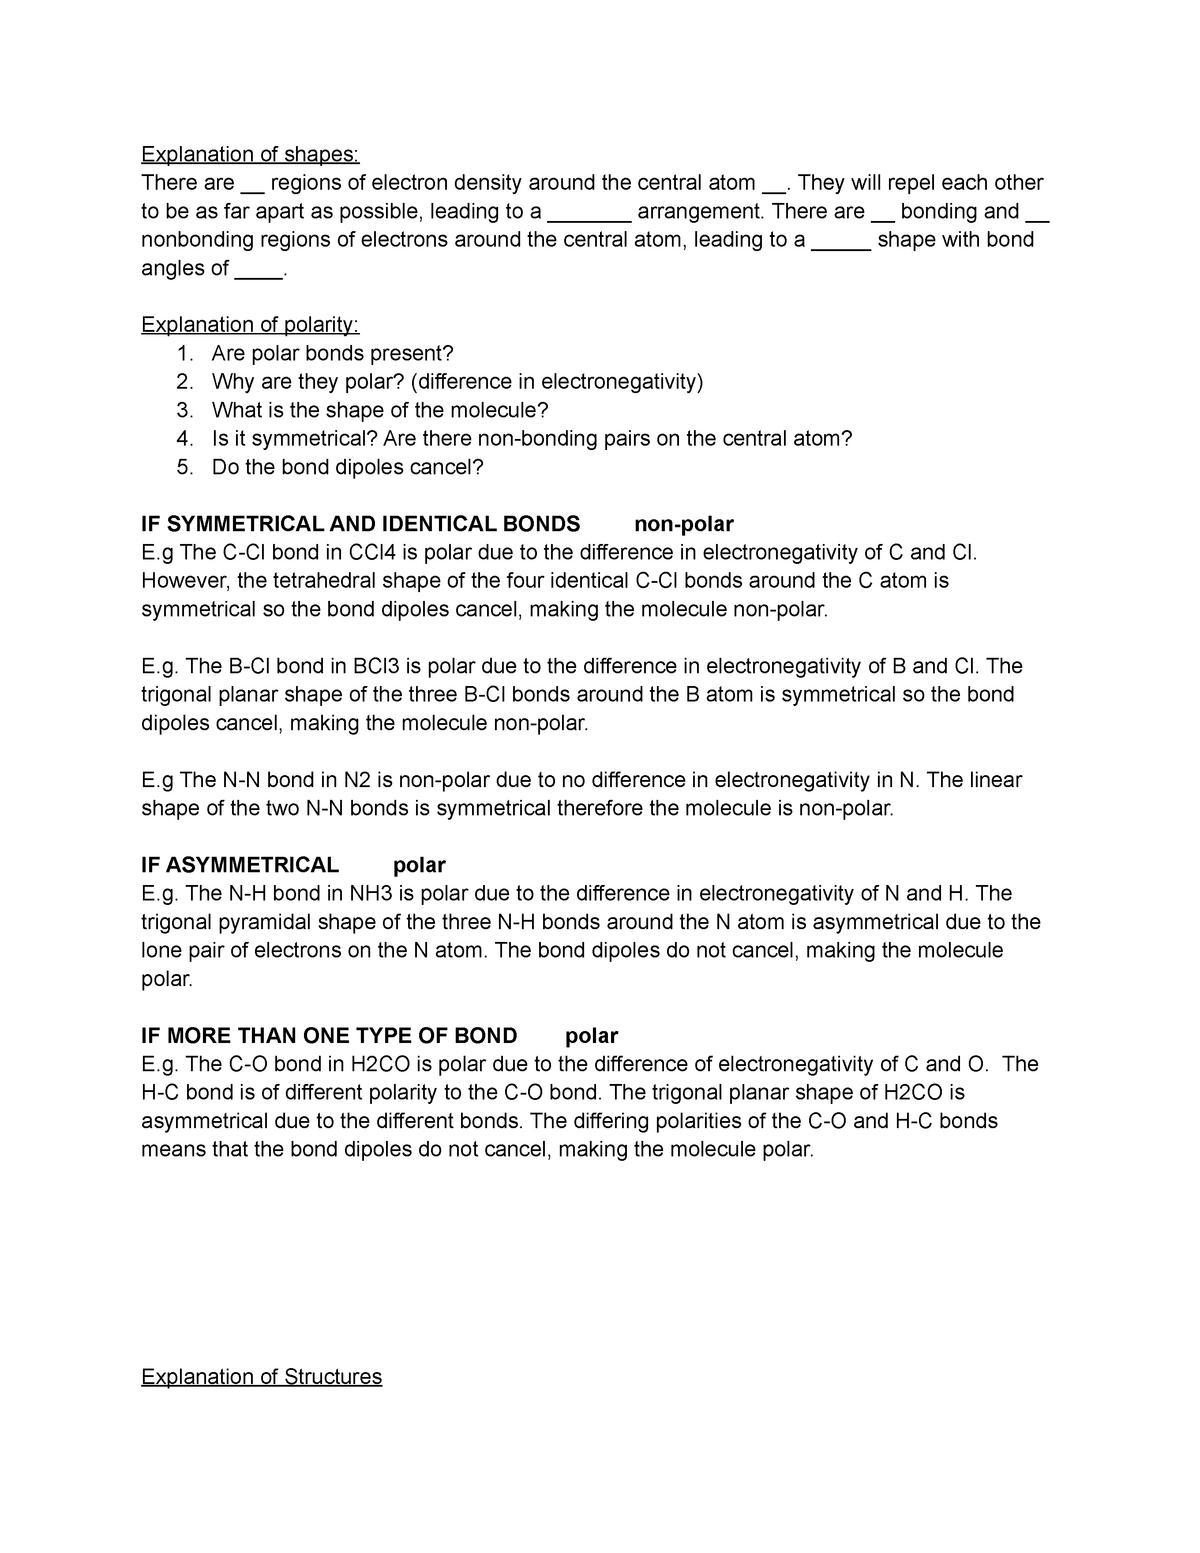 Chem 2 4 Explanations Farmacologia 00441 Studocu